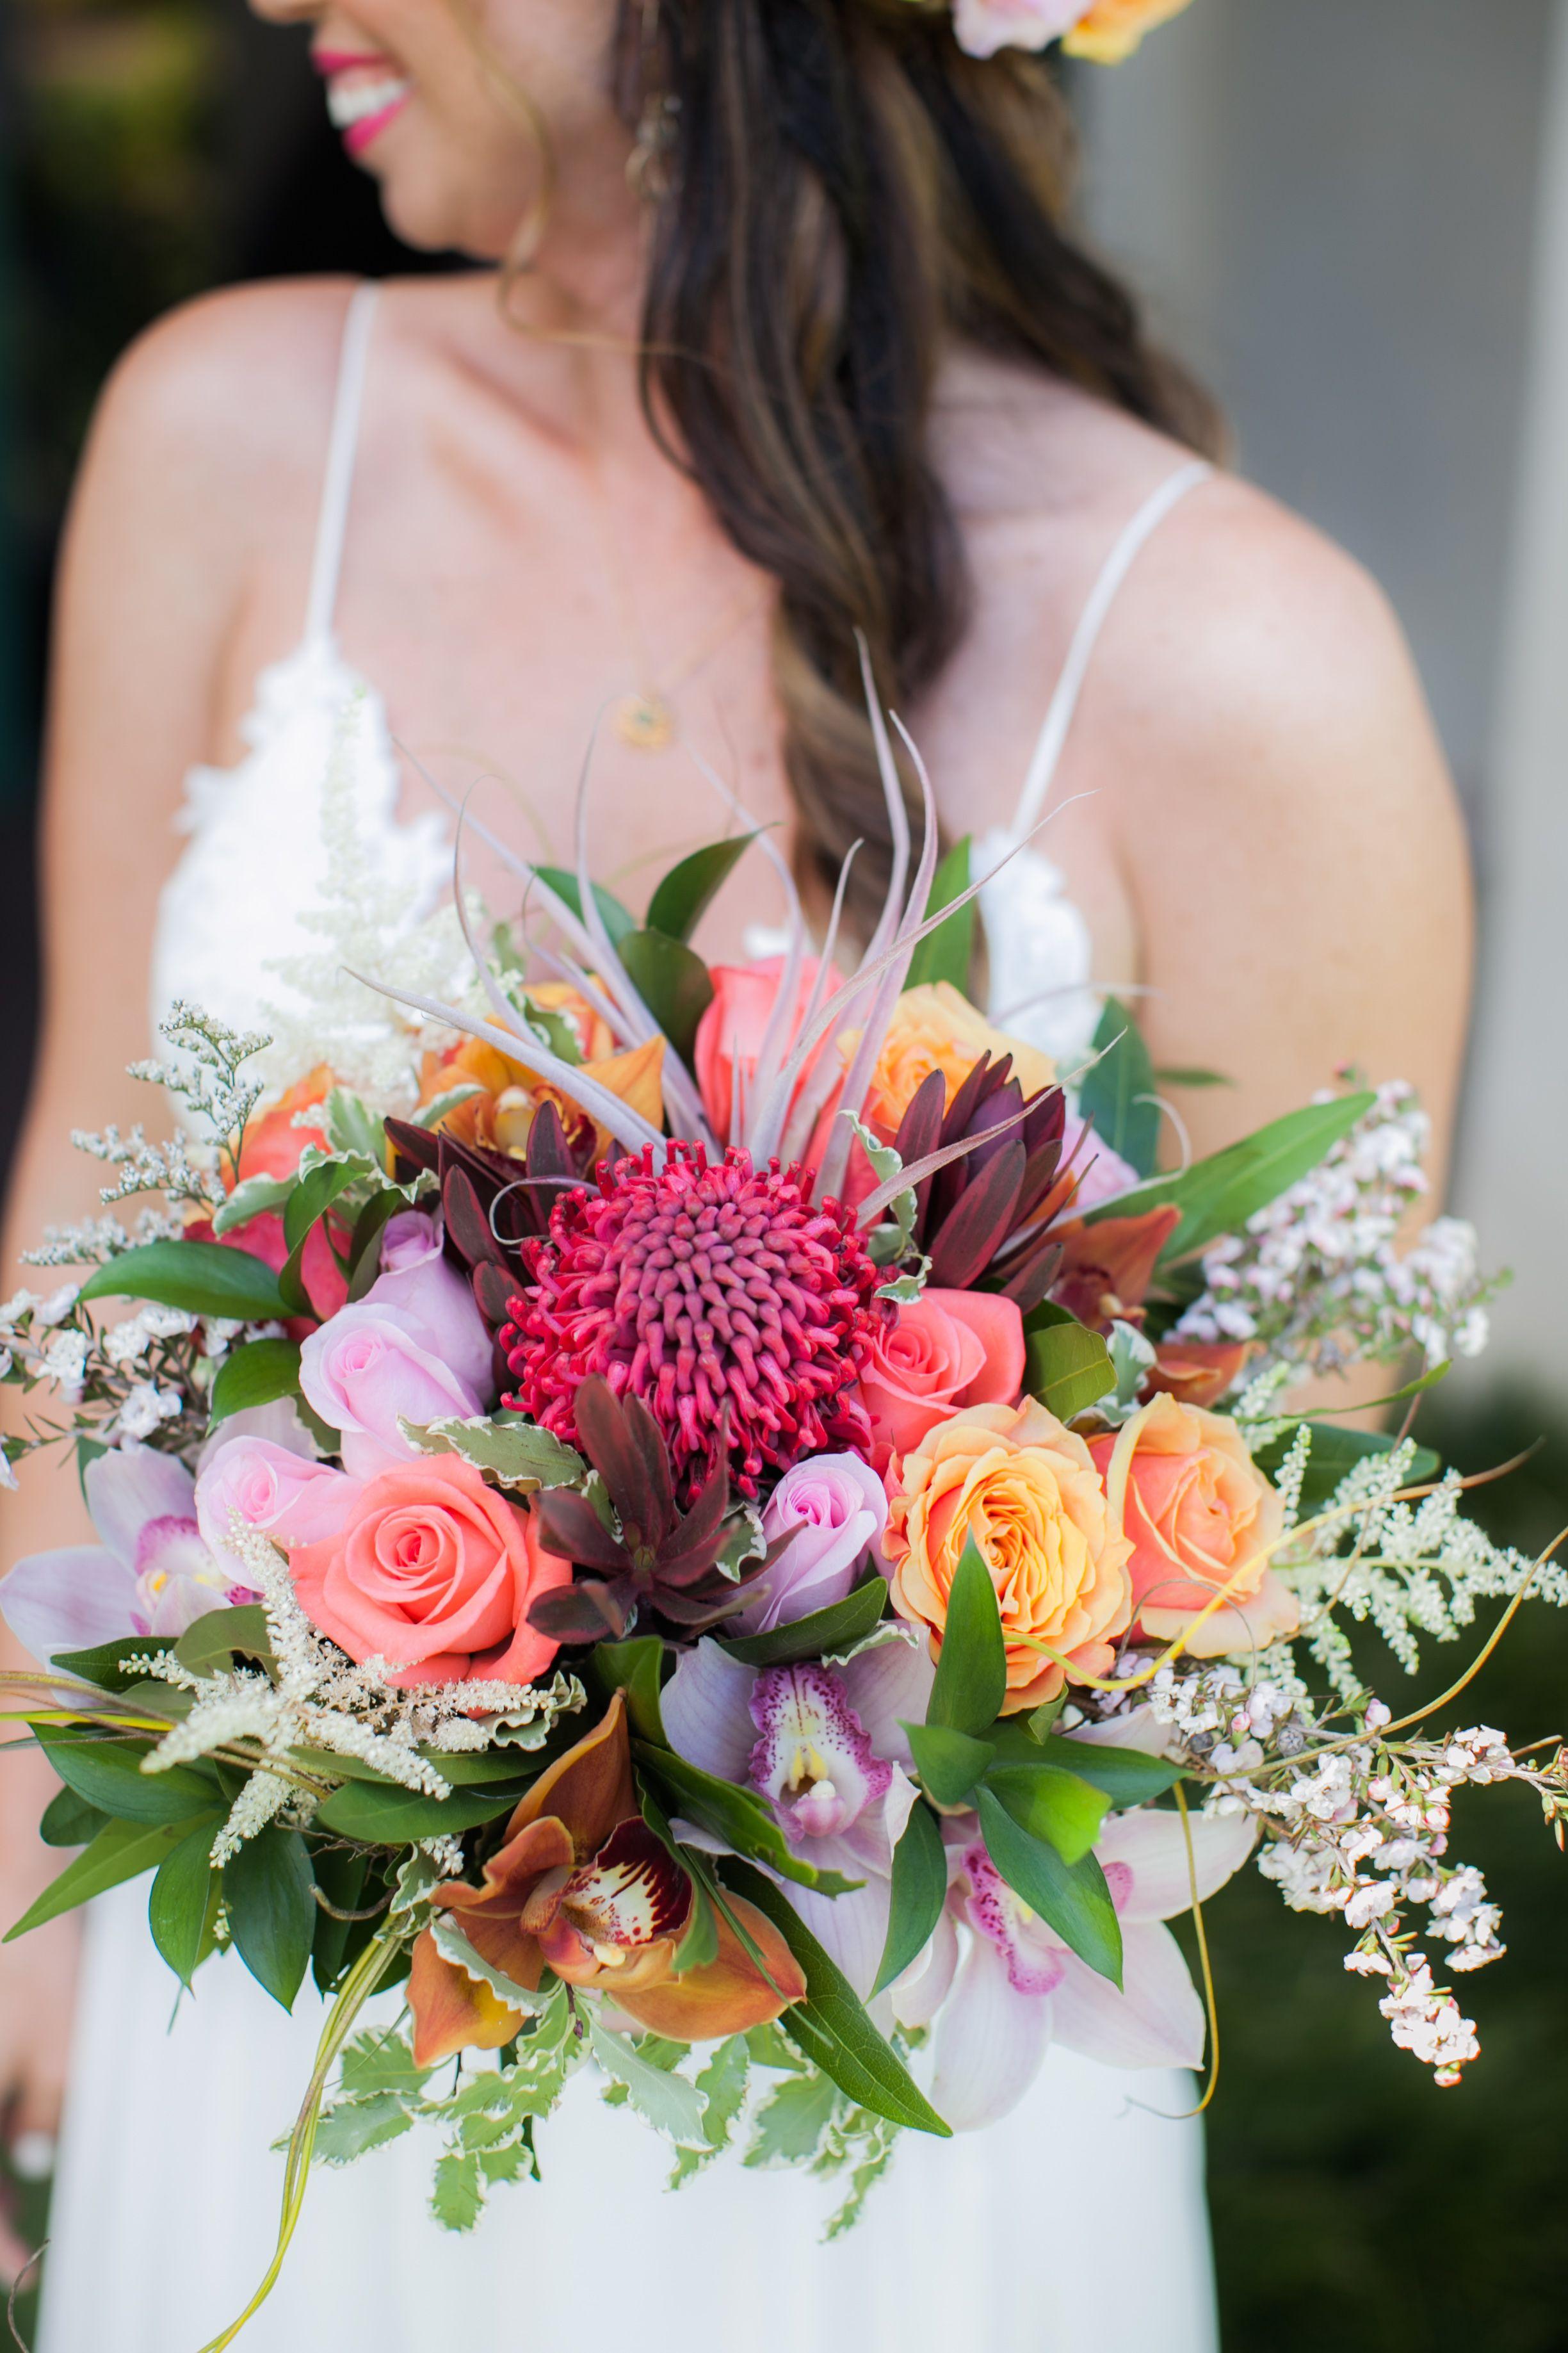 Clane Gessel Photography Bridal Bouquet wedding bouquet